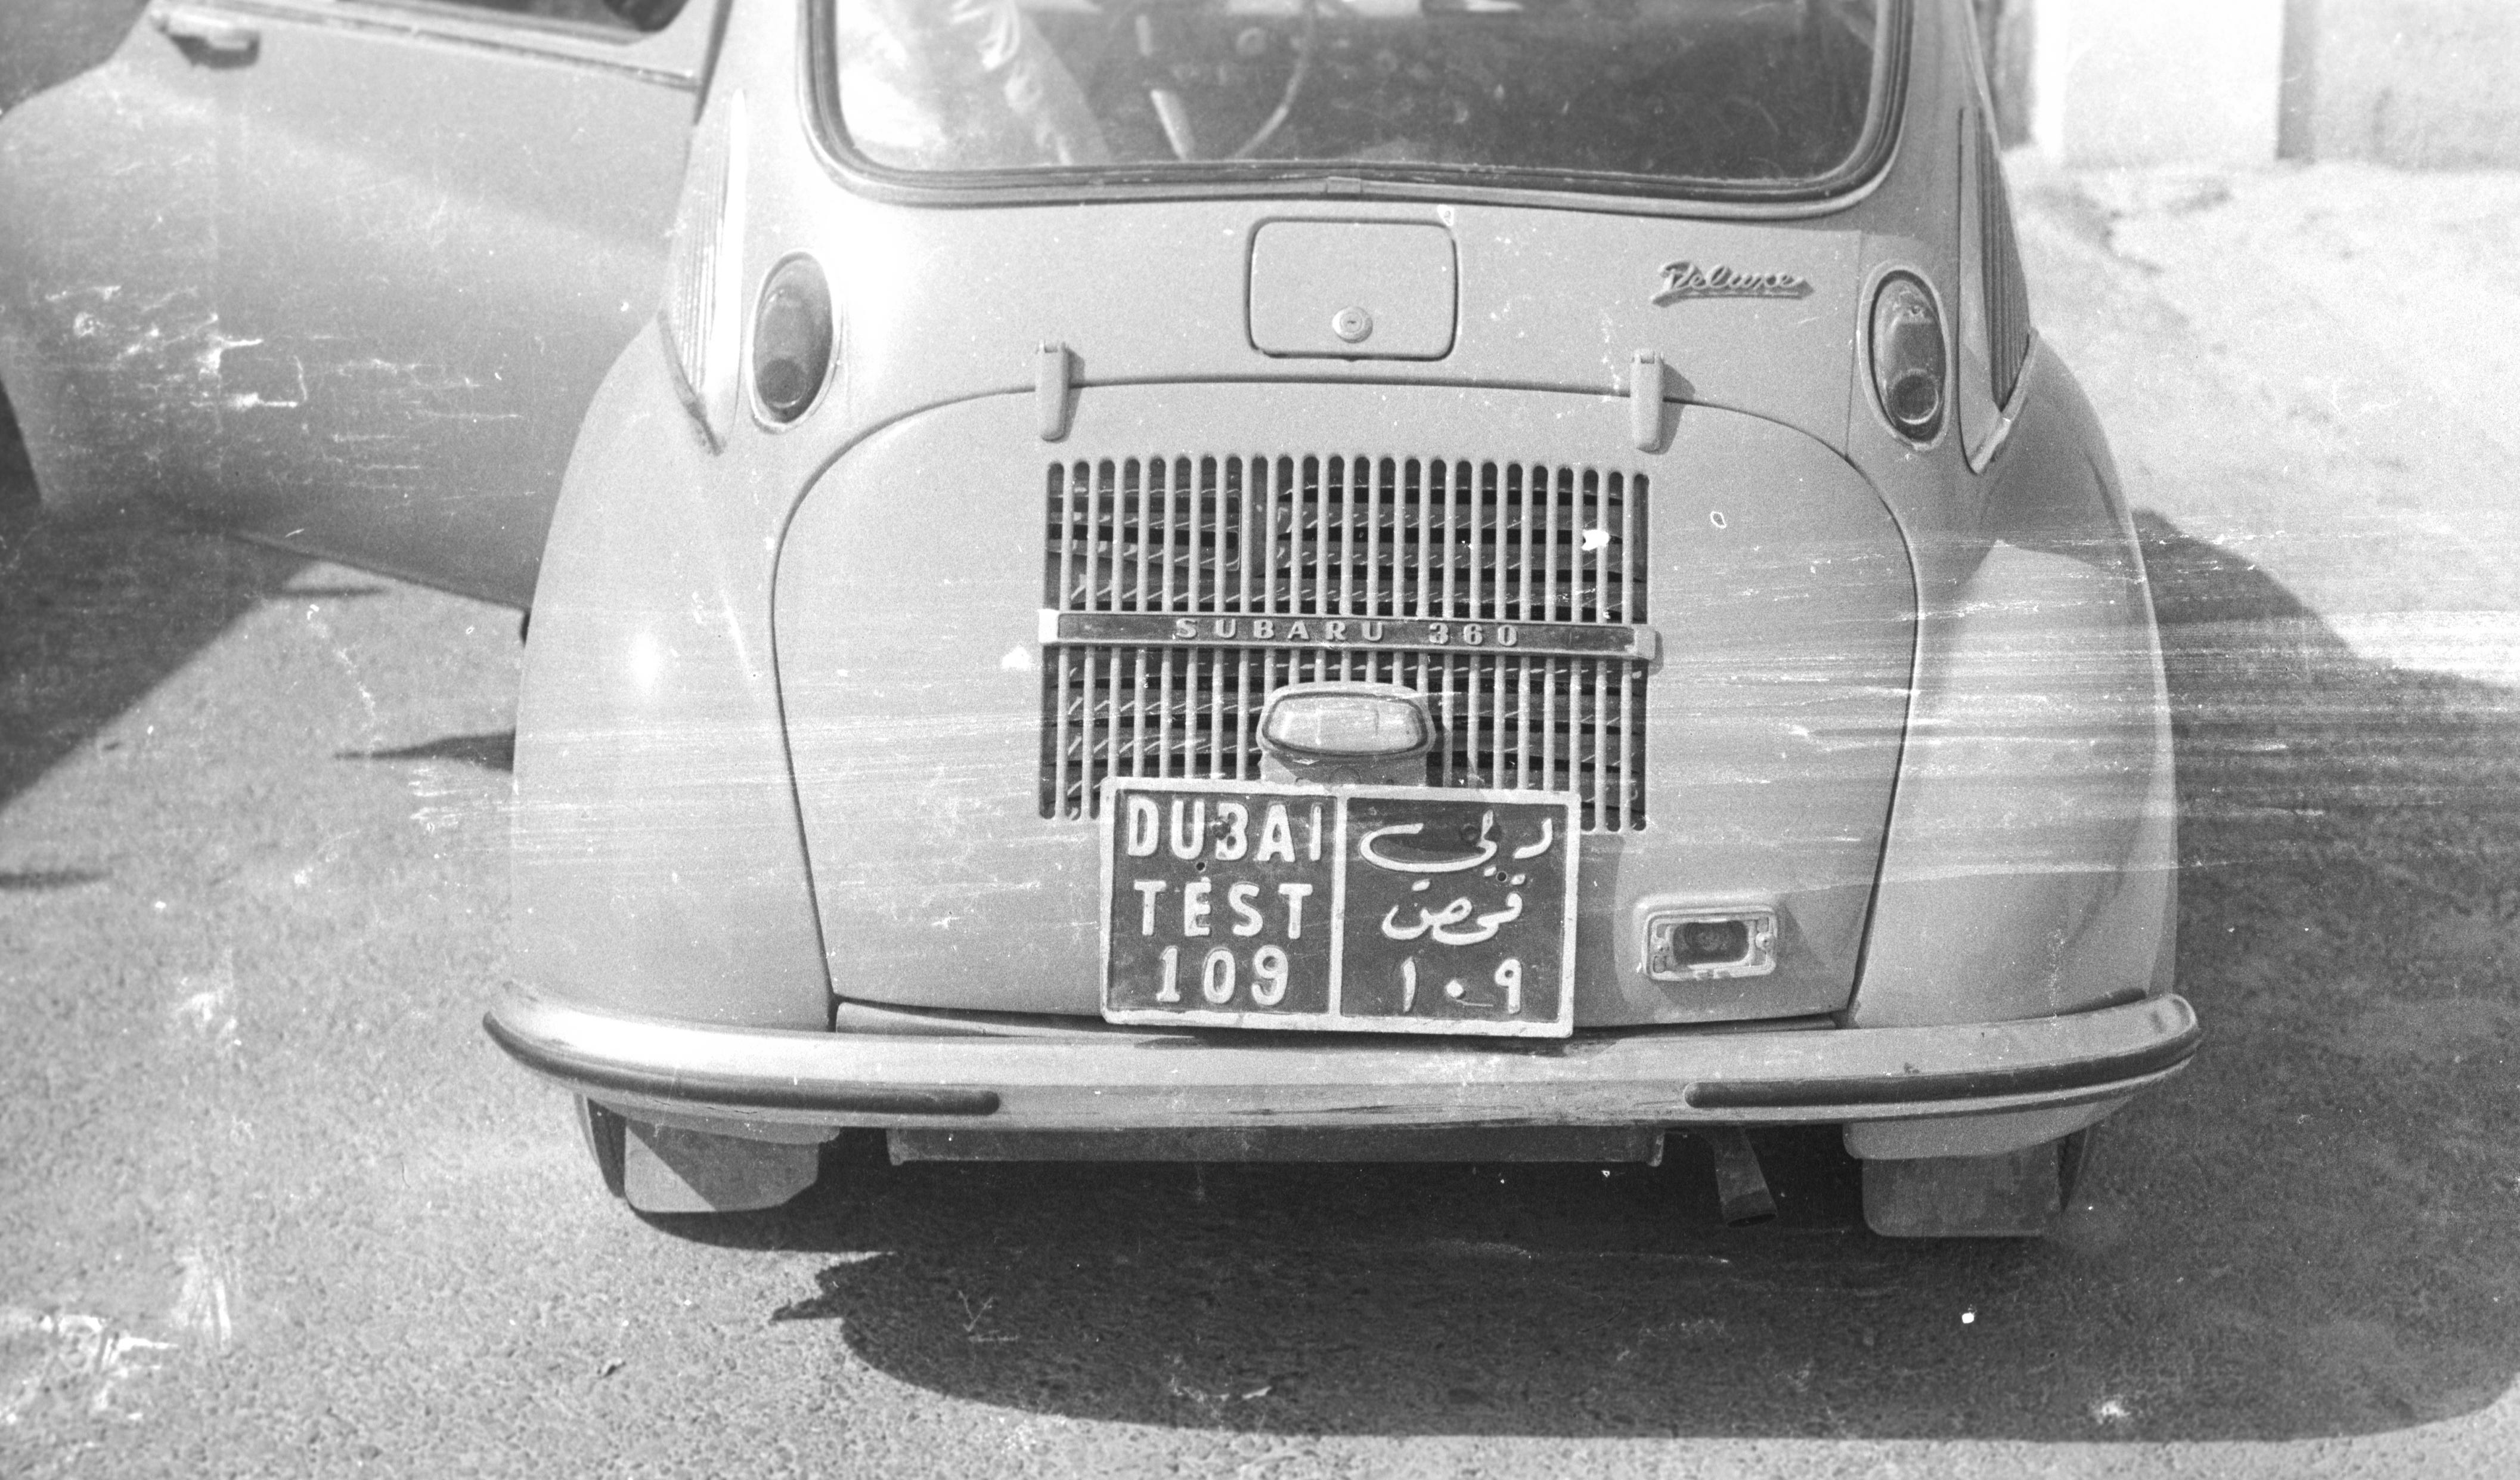 (UAE)(Dub 64c-76)(dlr)_Test 109_VBmb1970s